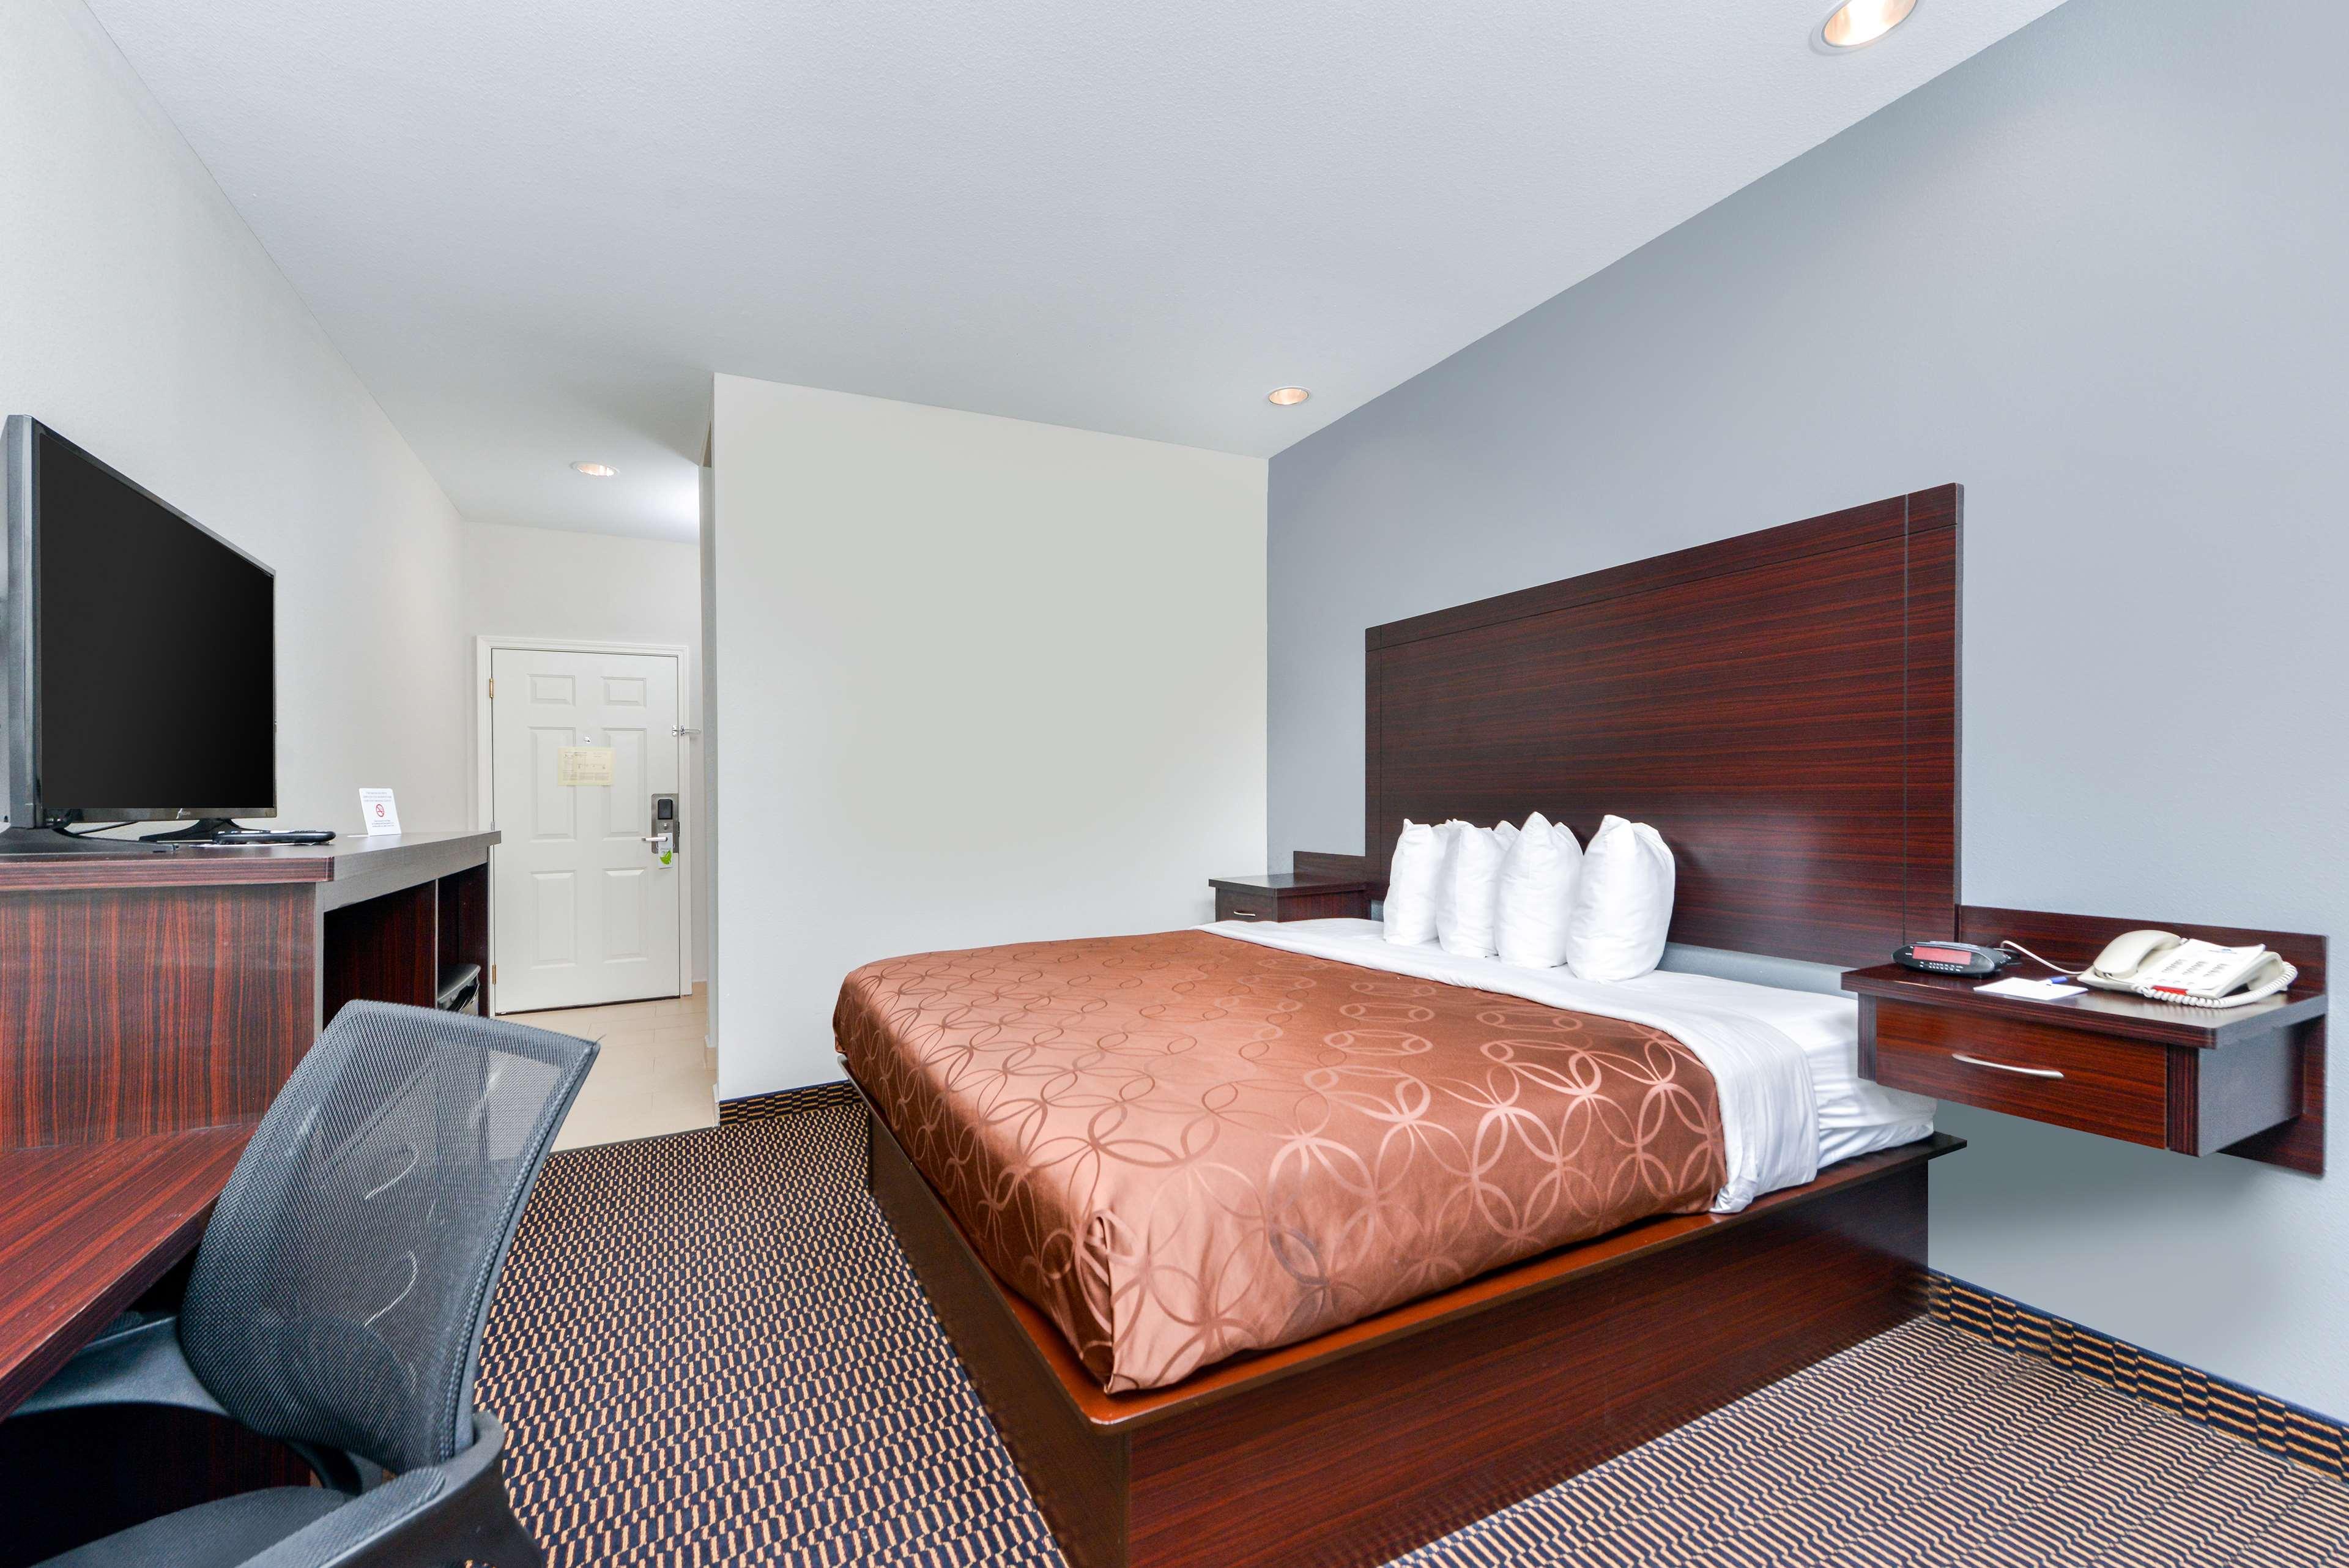 Americas Best Value Inn - Baton Rouge / College Drive image 6